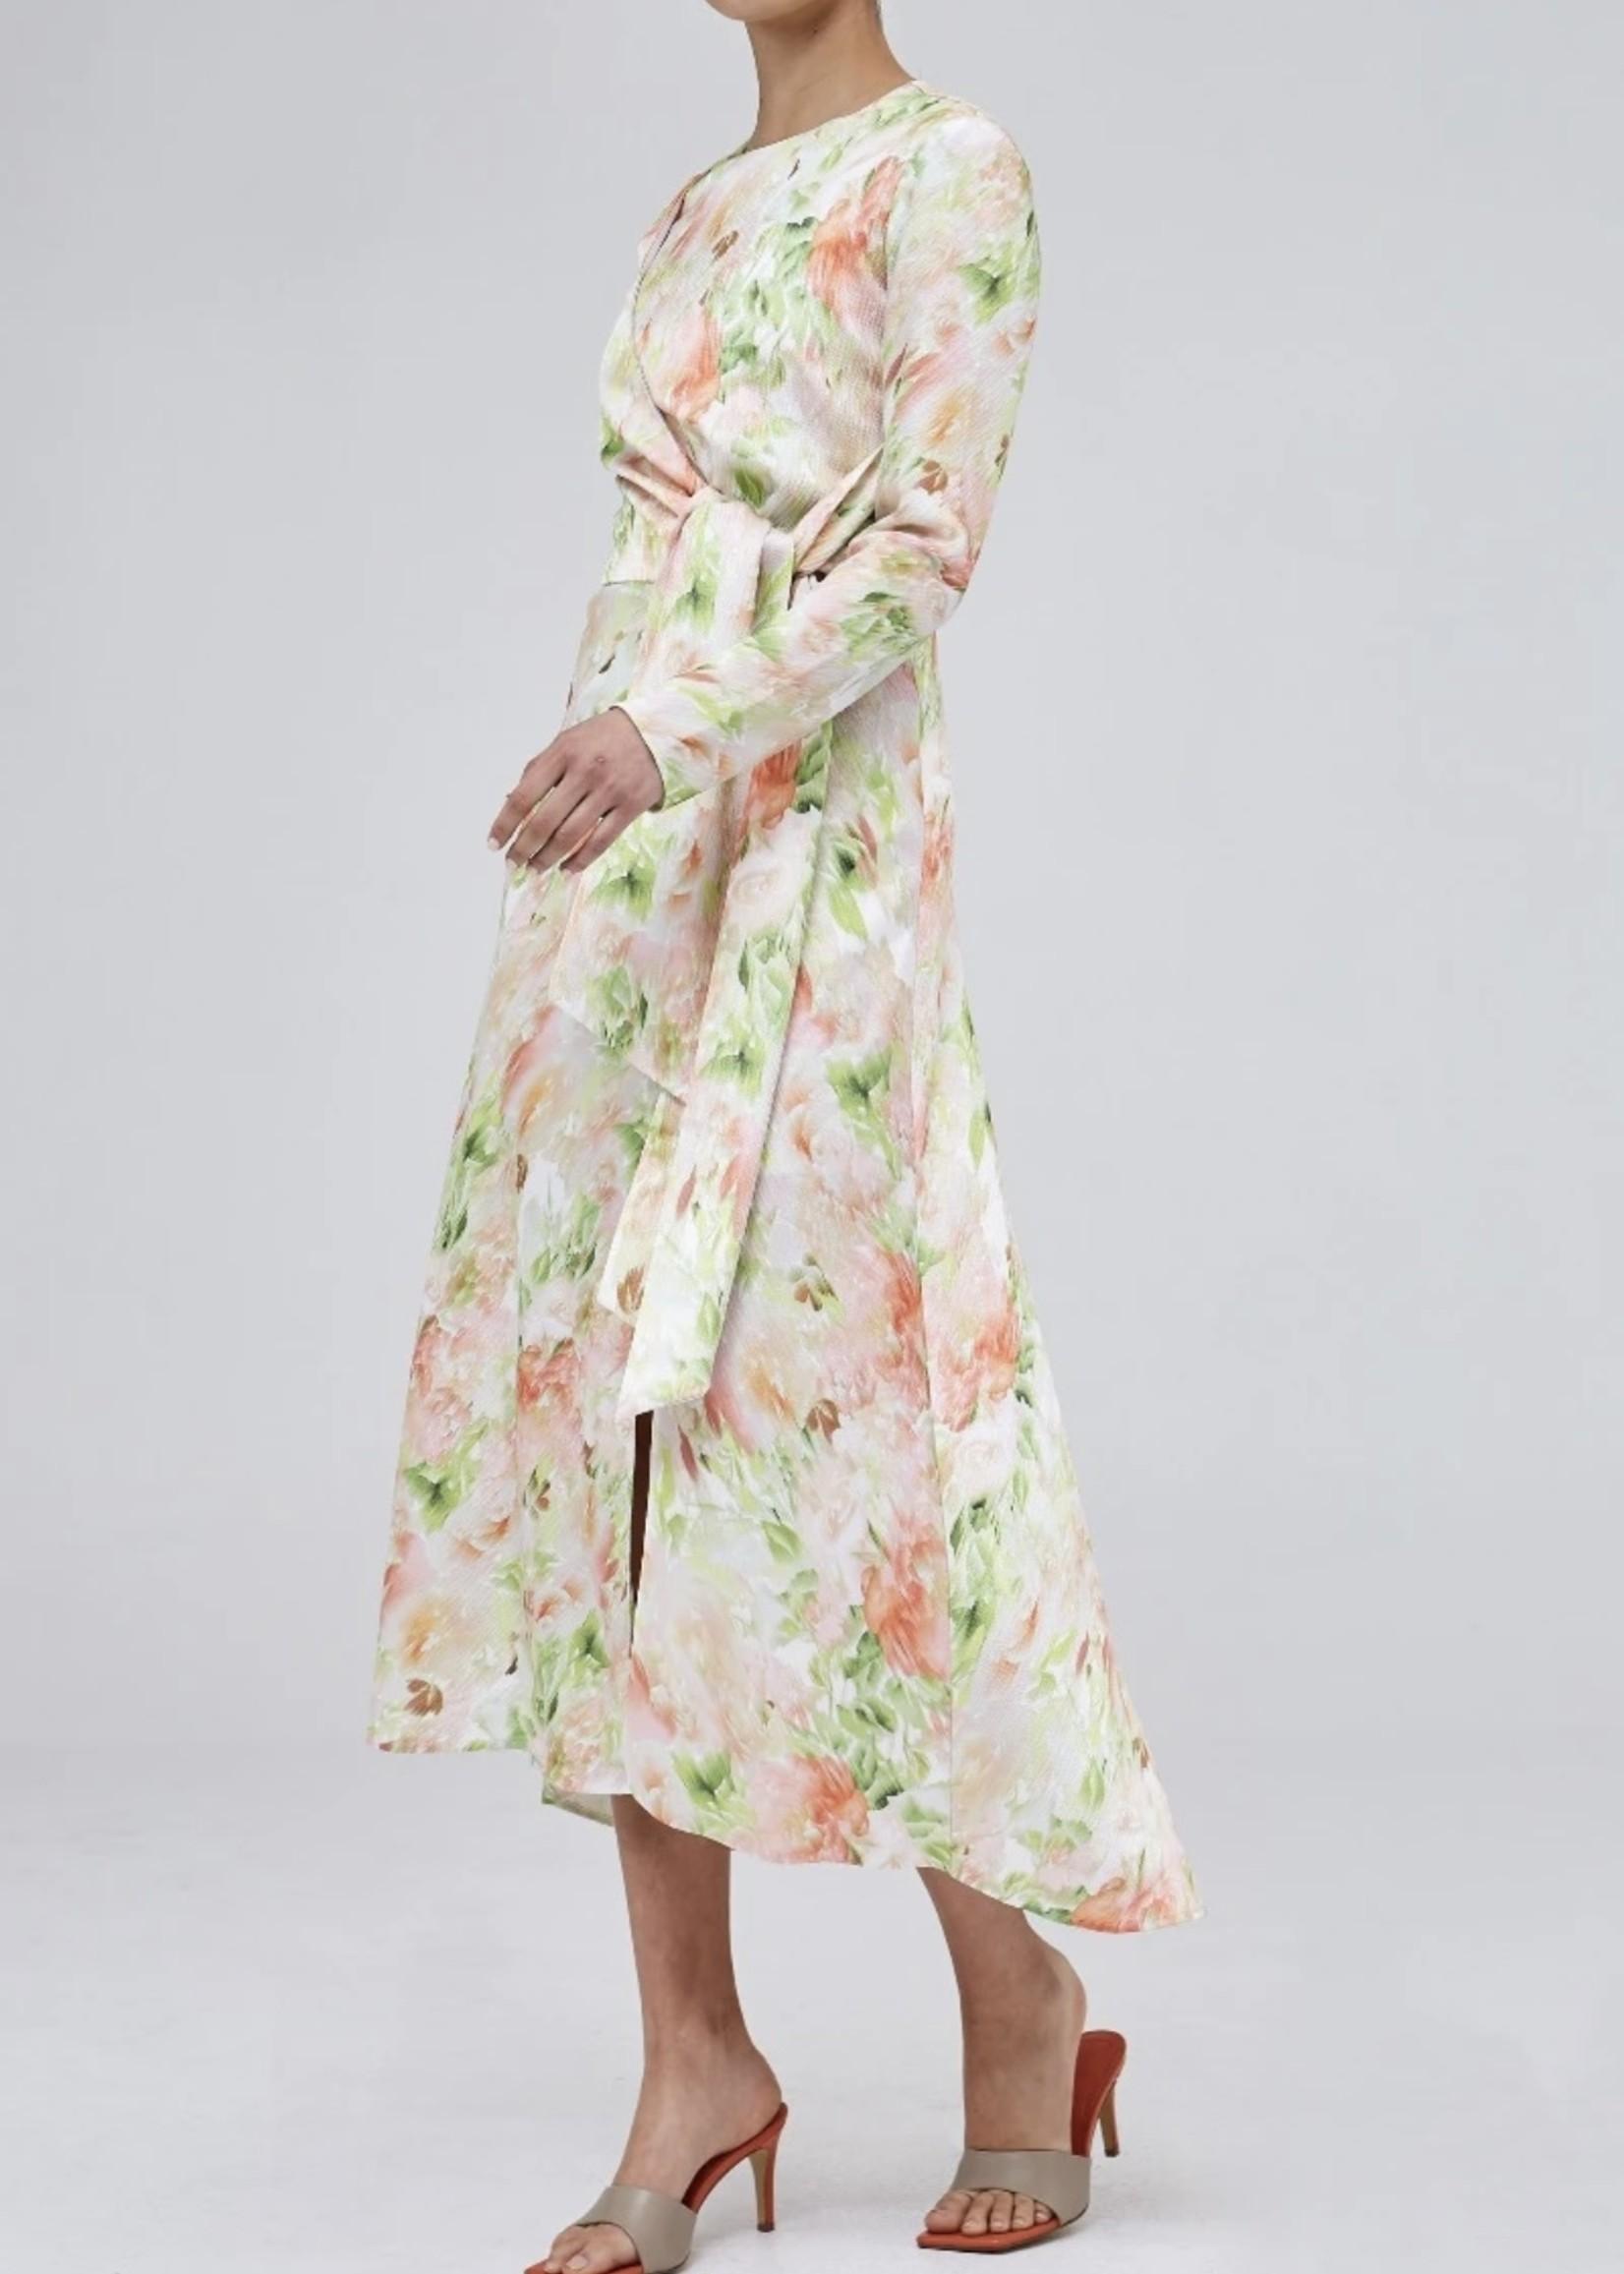 Elitaire Boutique Opposite Sides Floral Dress